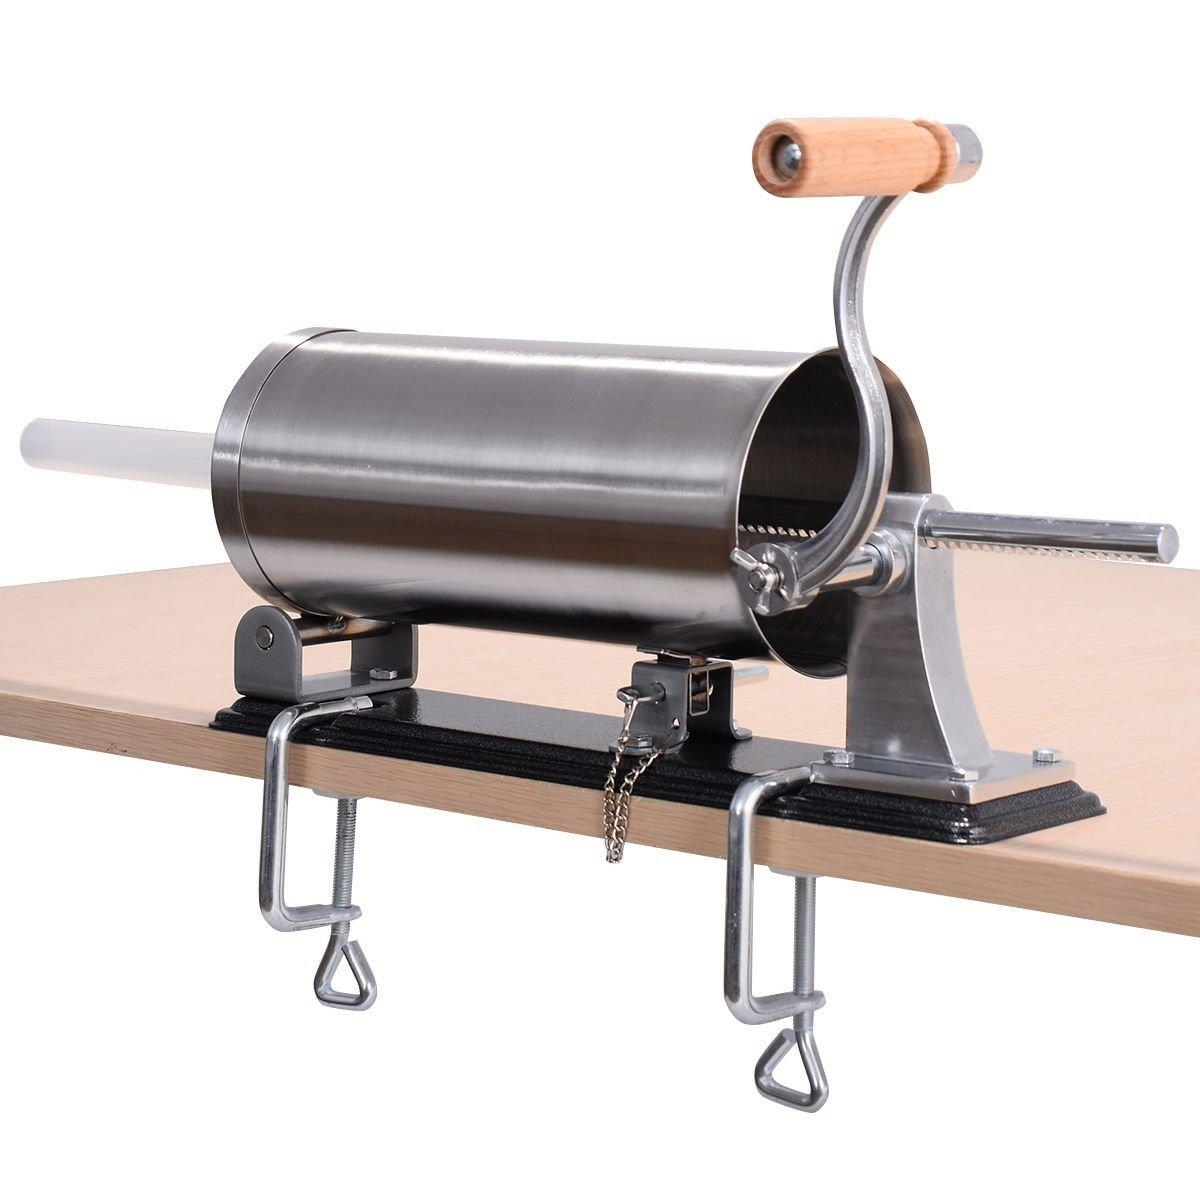 Hot 3.6L Sausage Stuffer Maker Meat Filler Machine Stainless Steel Commercial Bonus free ebook By Allgoodsdelight365